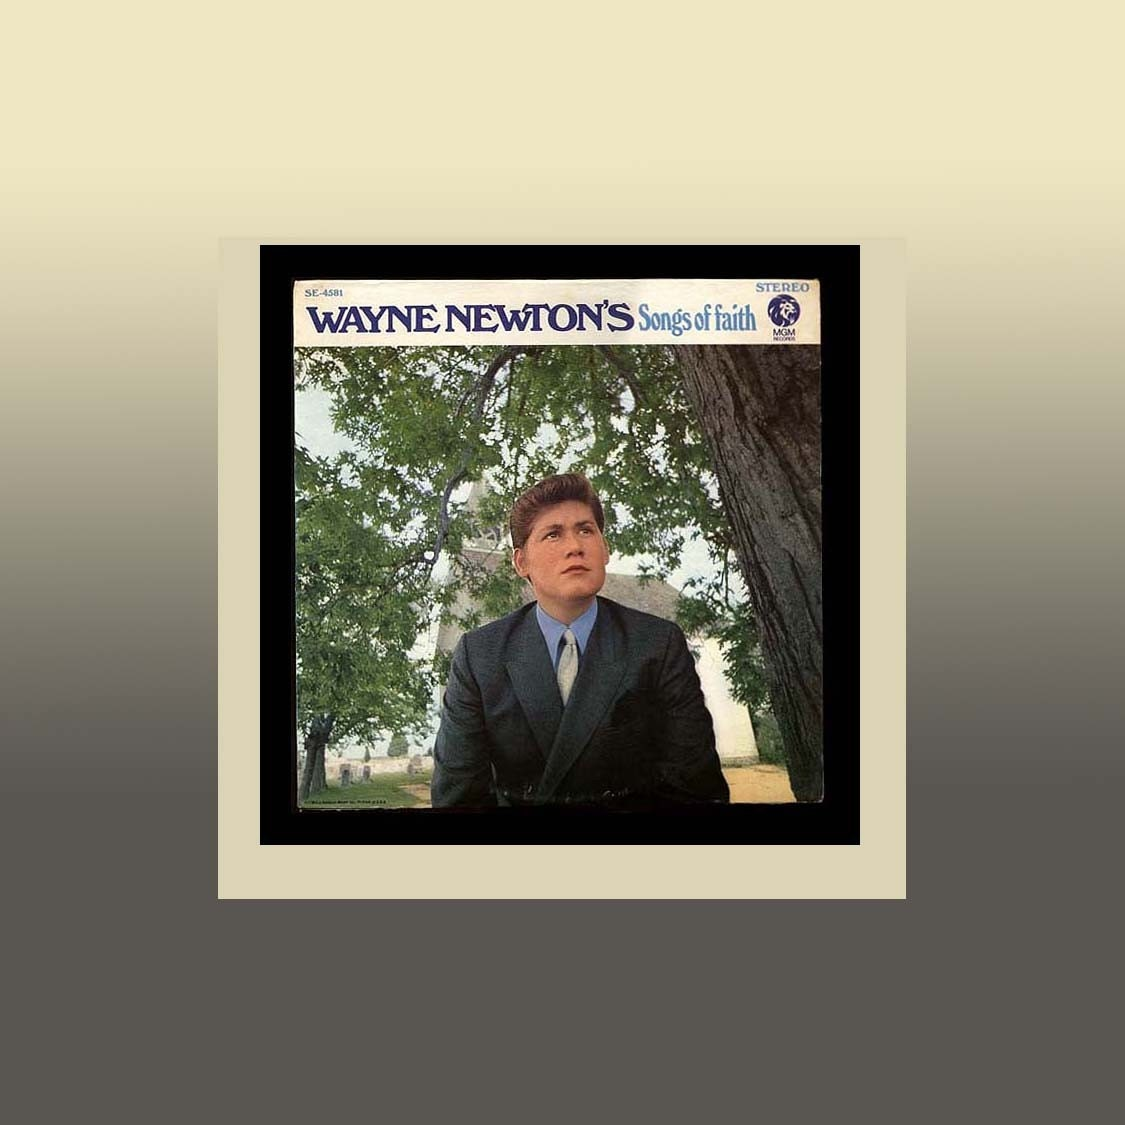 wayne newton u0026 39 s songs of faith gospel hymns vintage